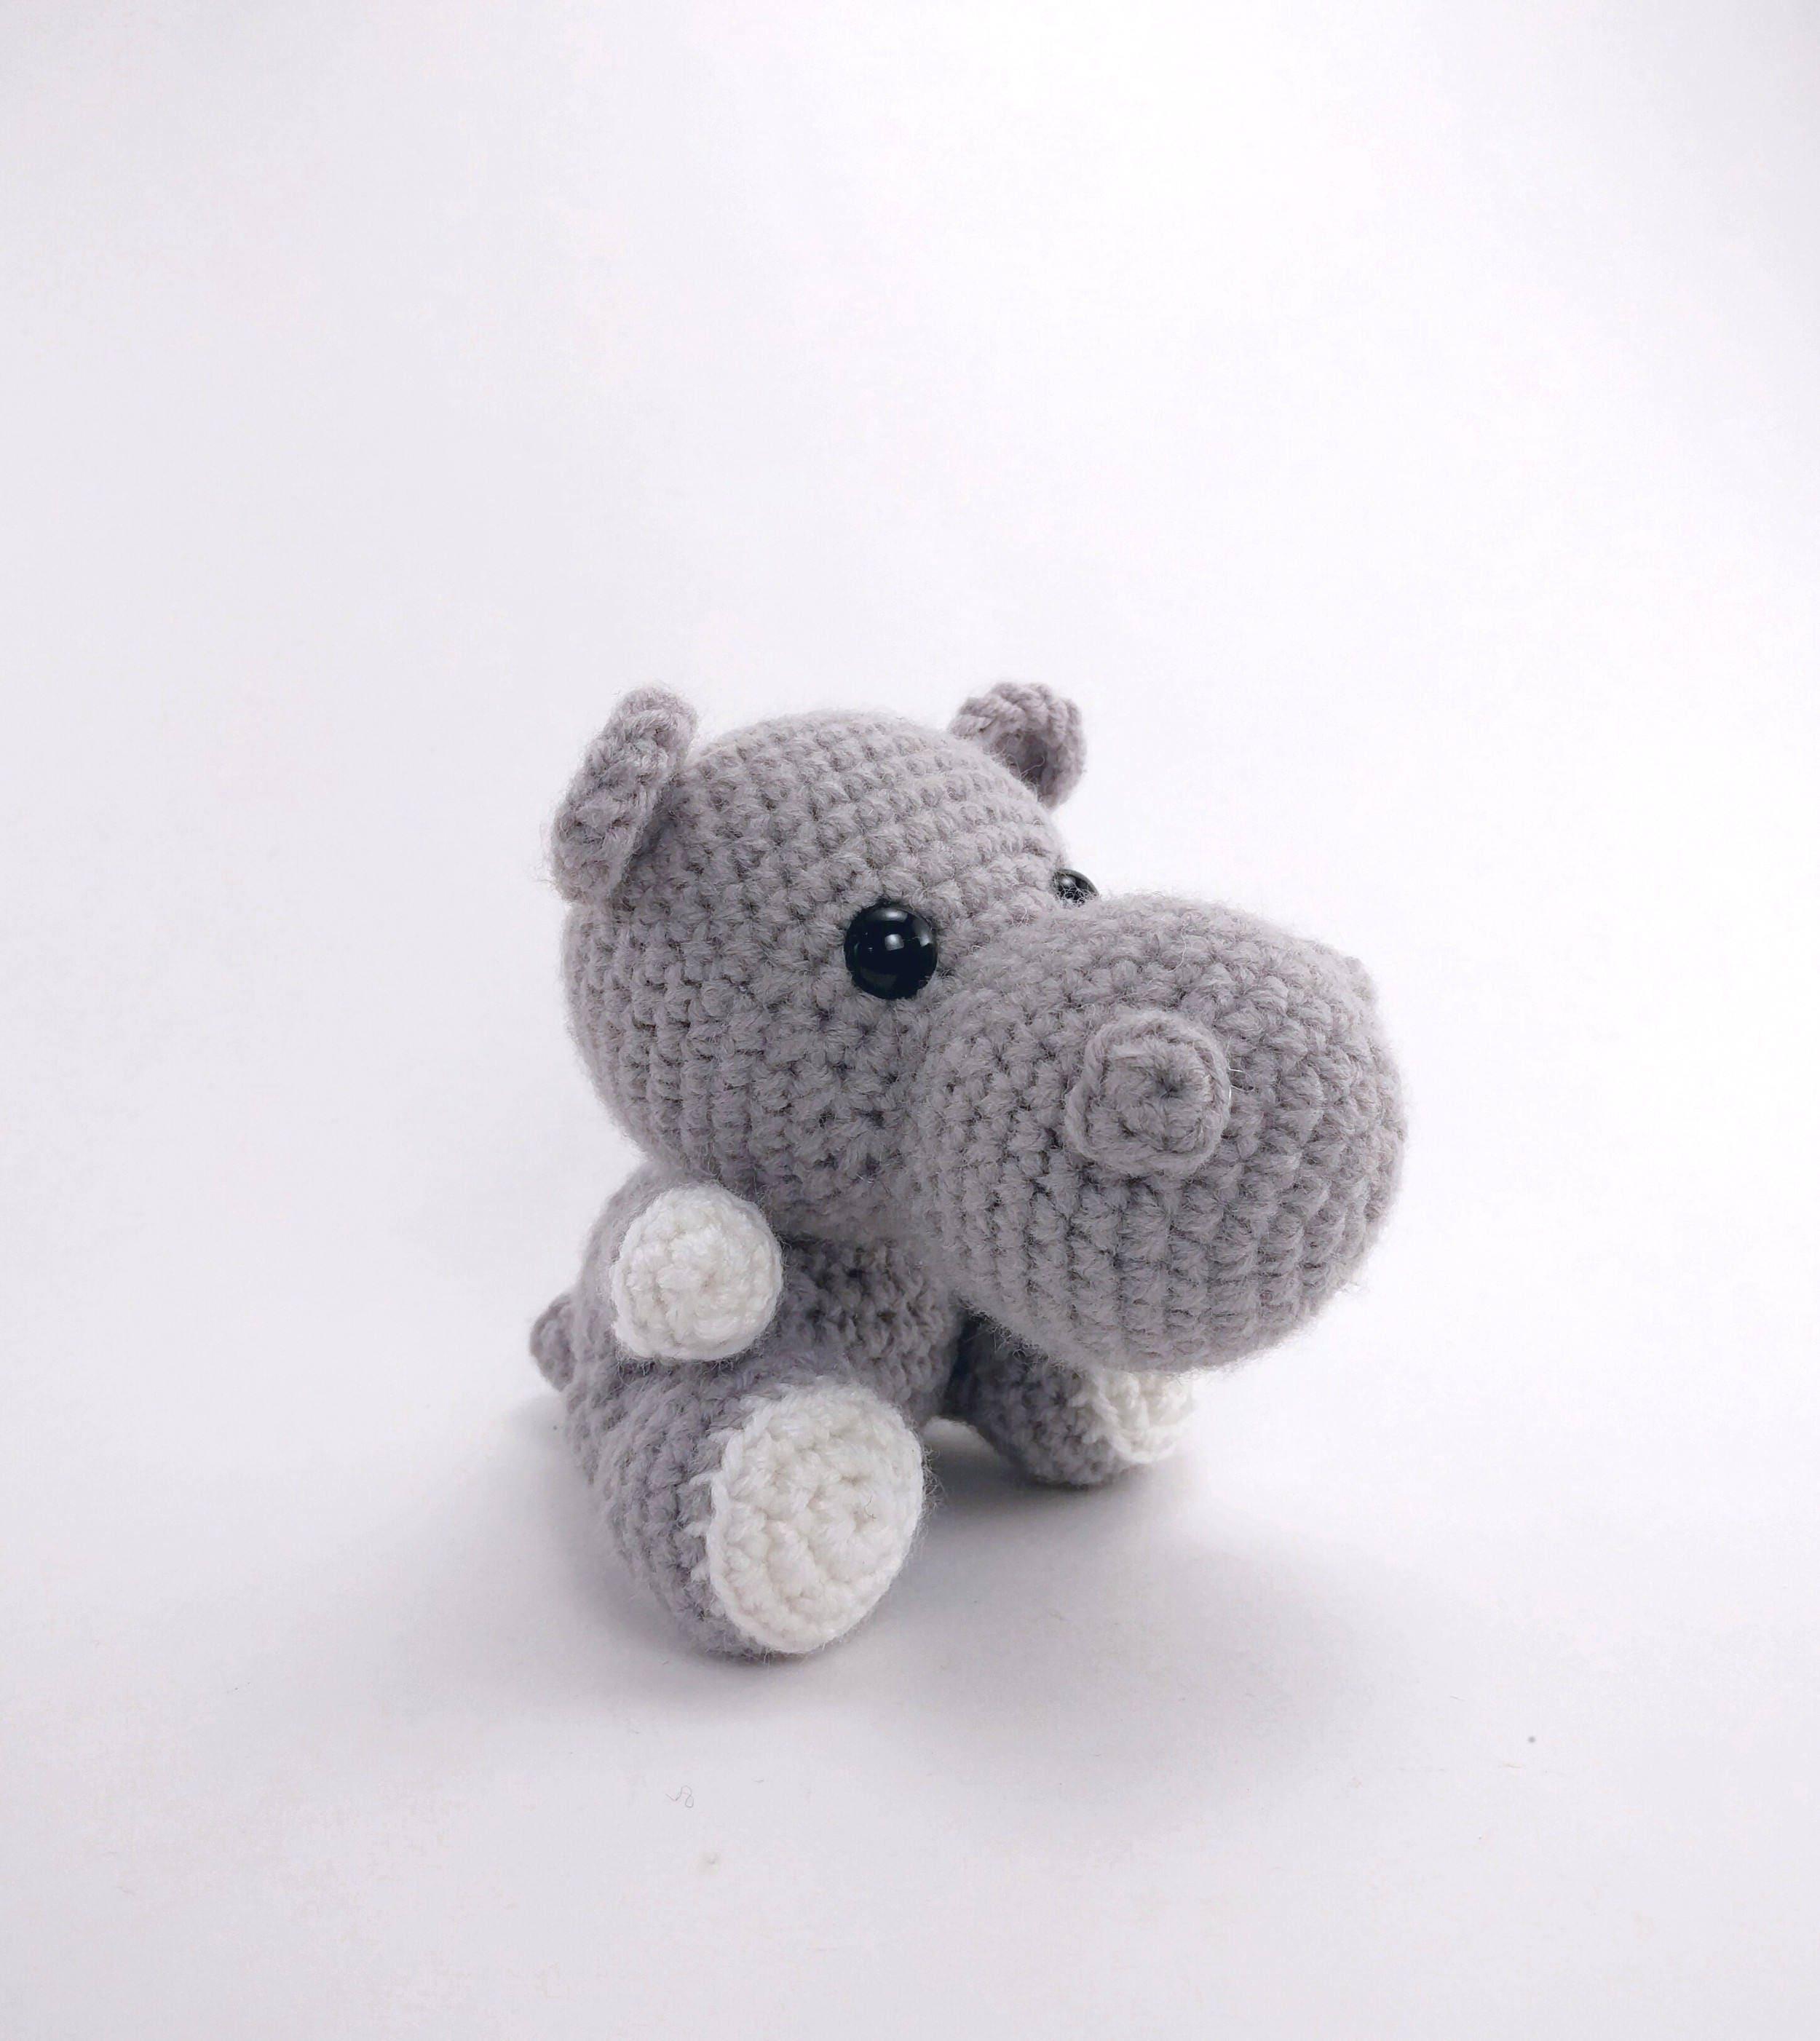 PATTERN: Hailey the Hippo Crochet hippo pattern amigurumi